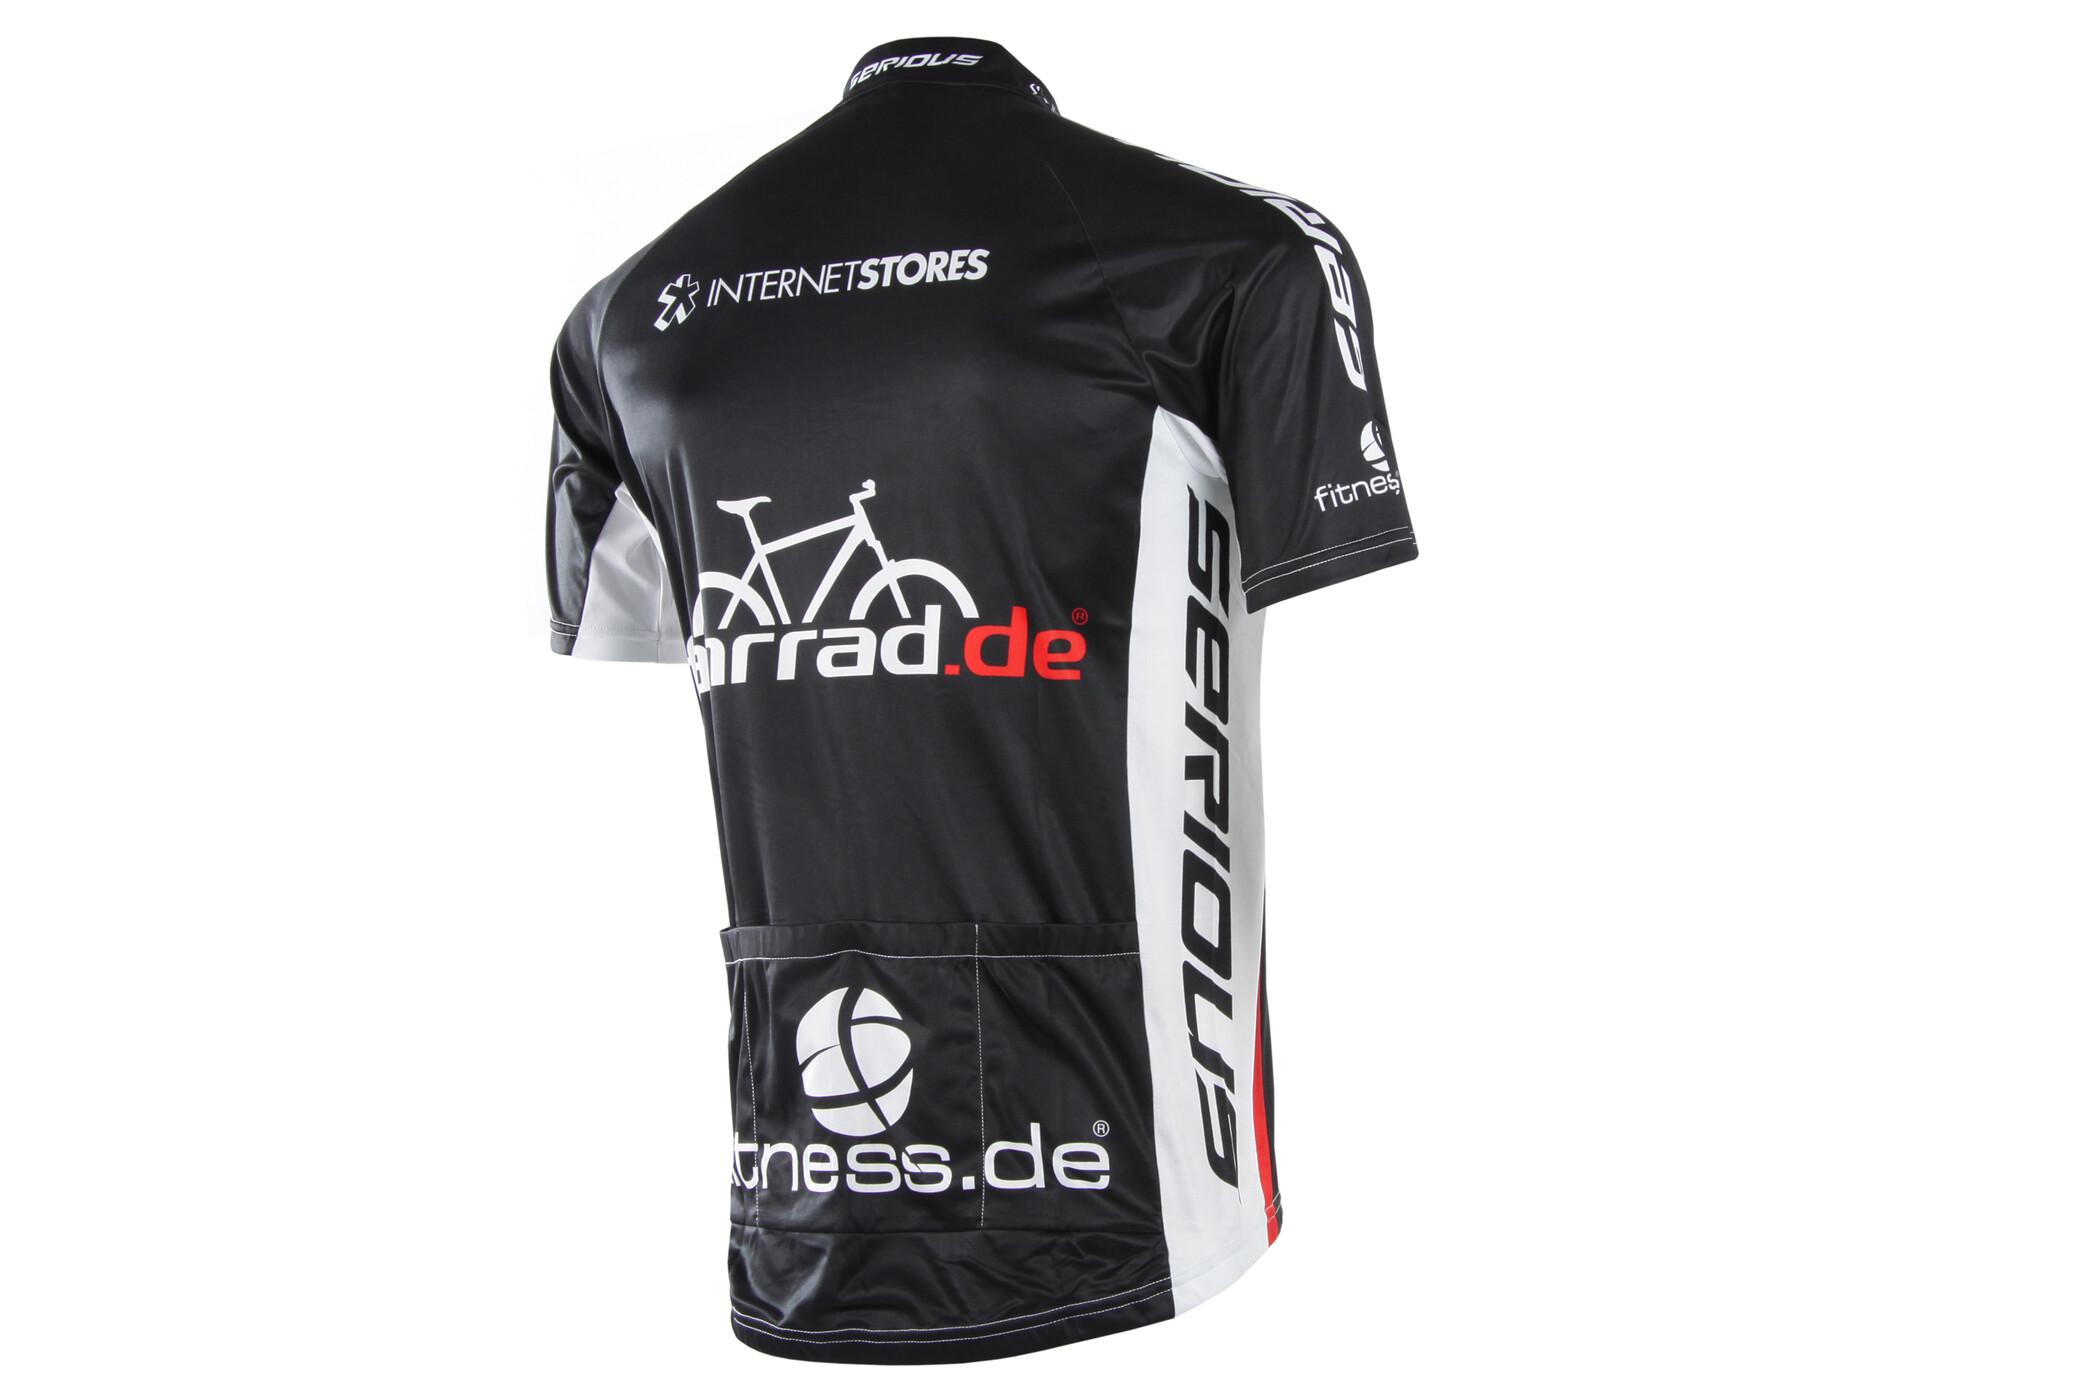 10_Medico_fahrrad_de_basic_team_jersey_2